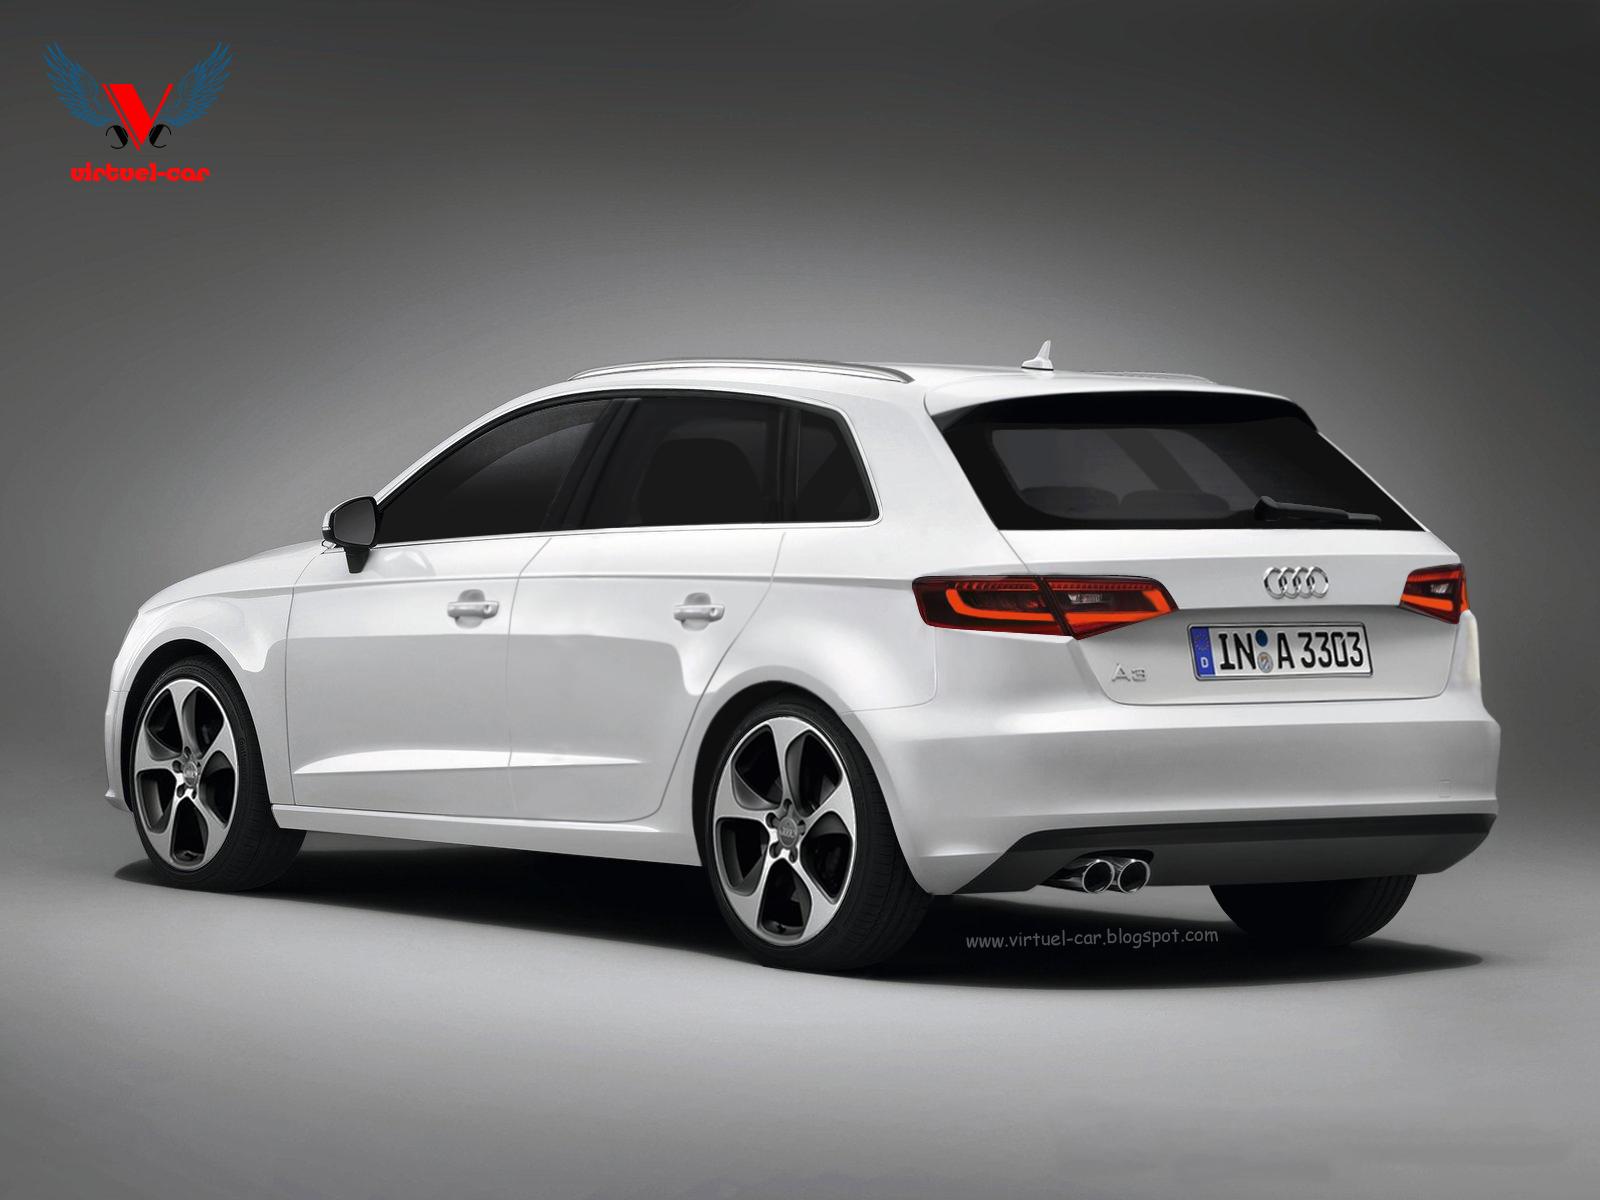 A3 Sportback Virtuel Car Audi A3 8v Sportback Audi A3